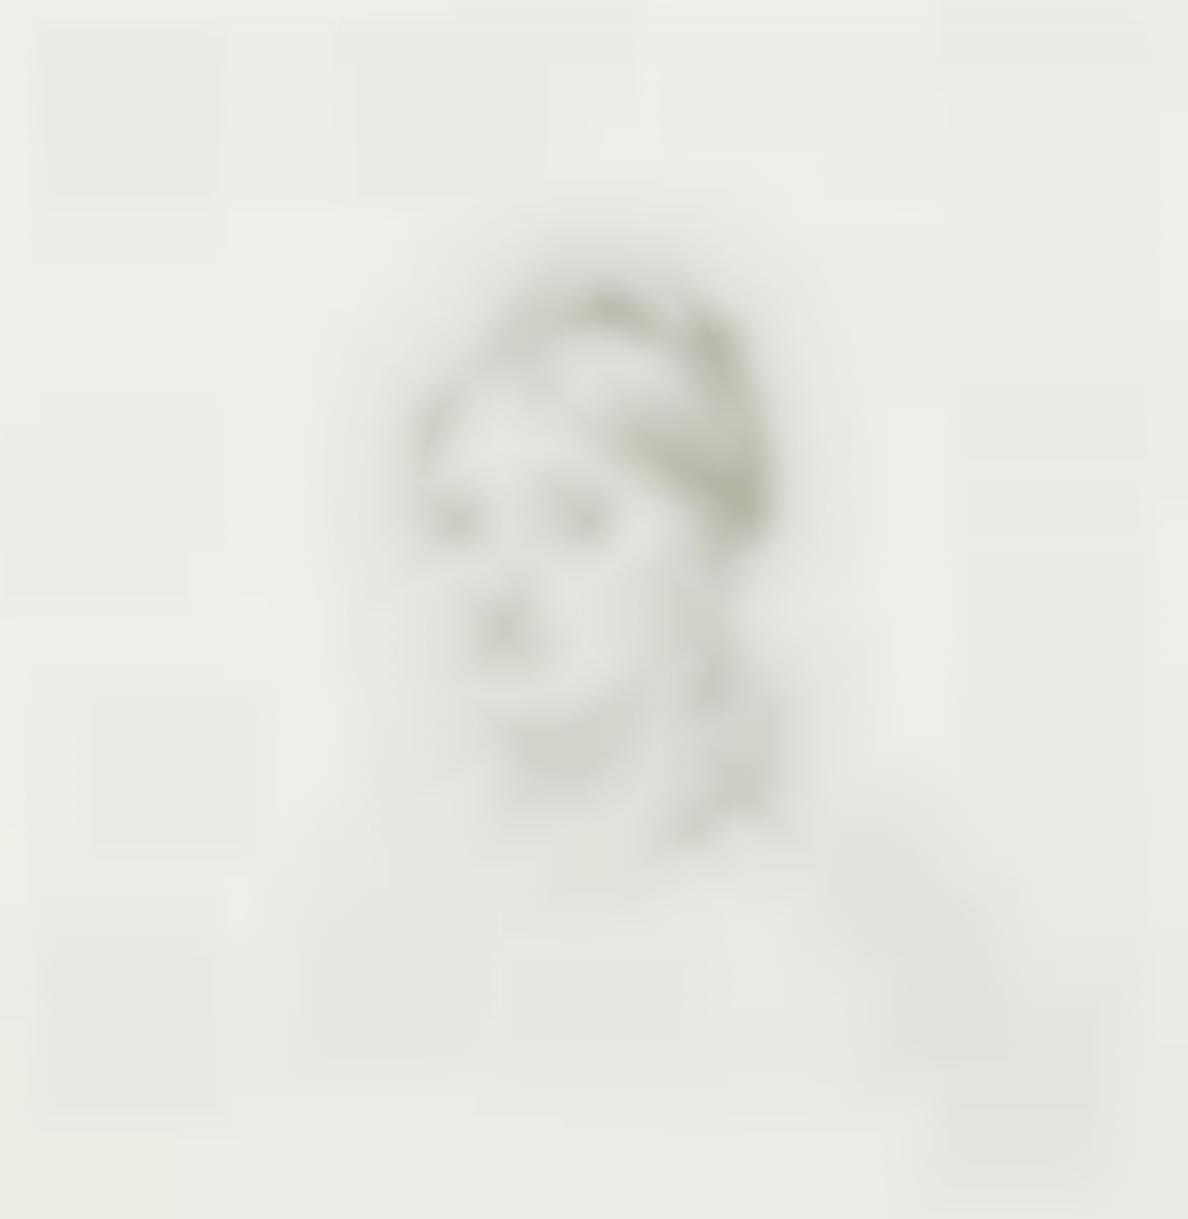 Victoria Gitman - A Beauty-2007